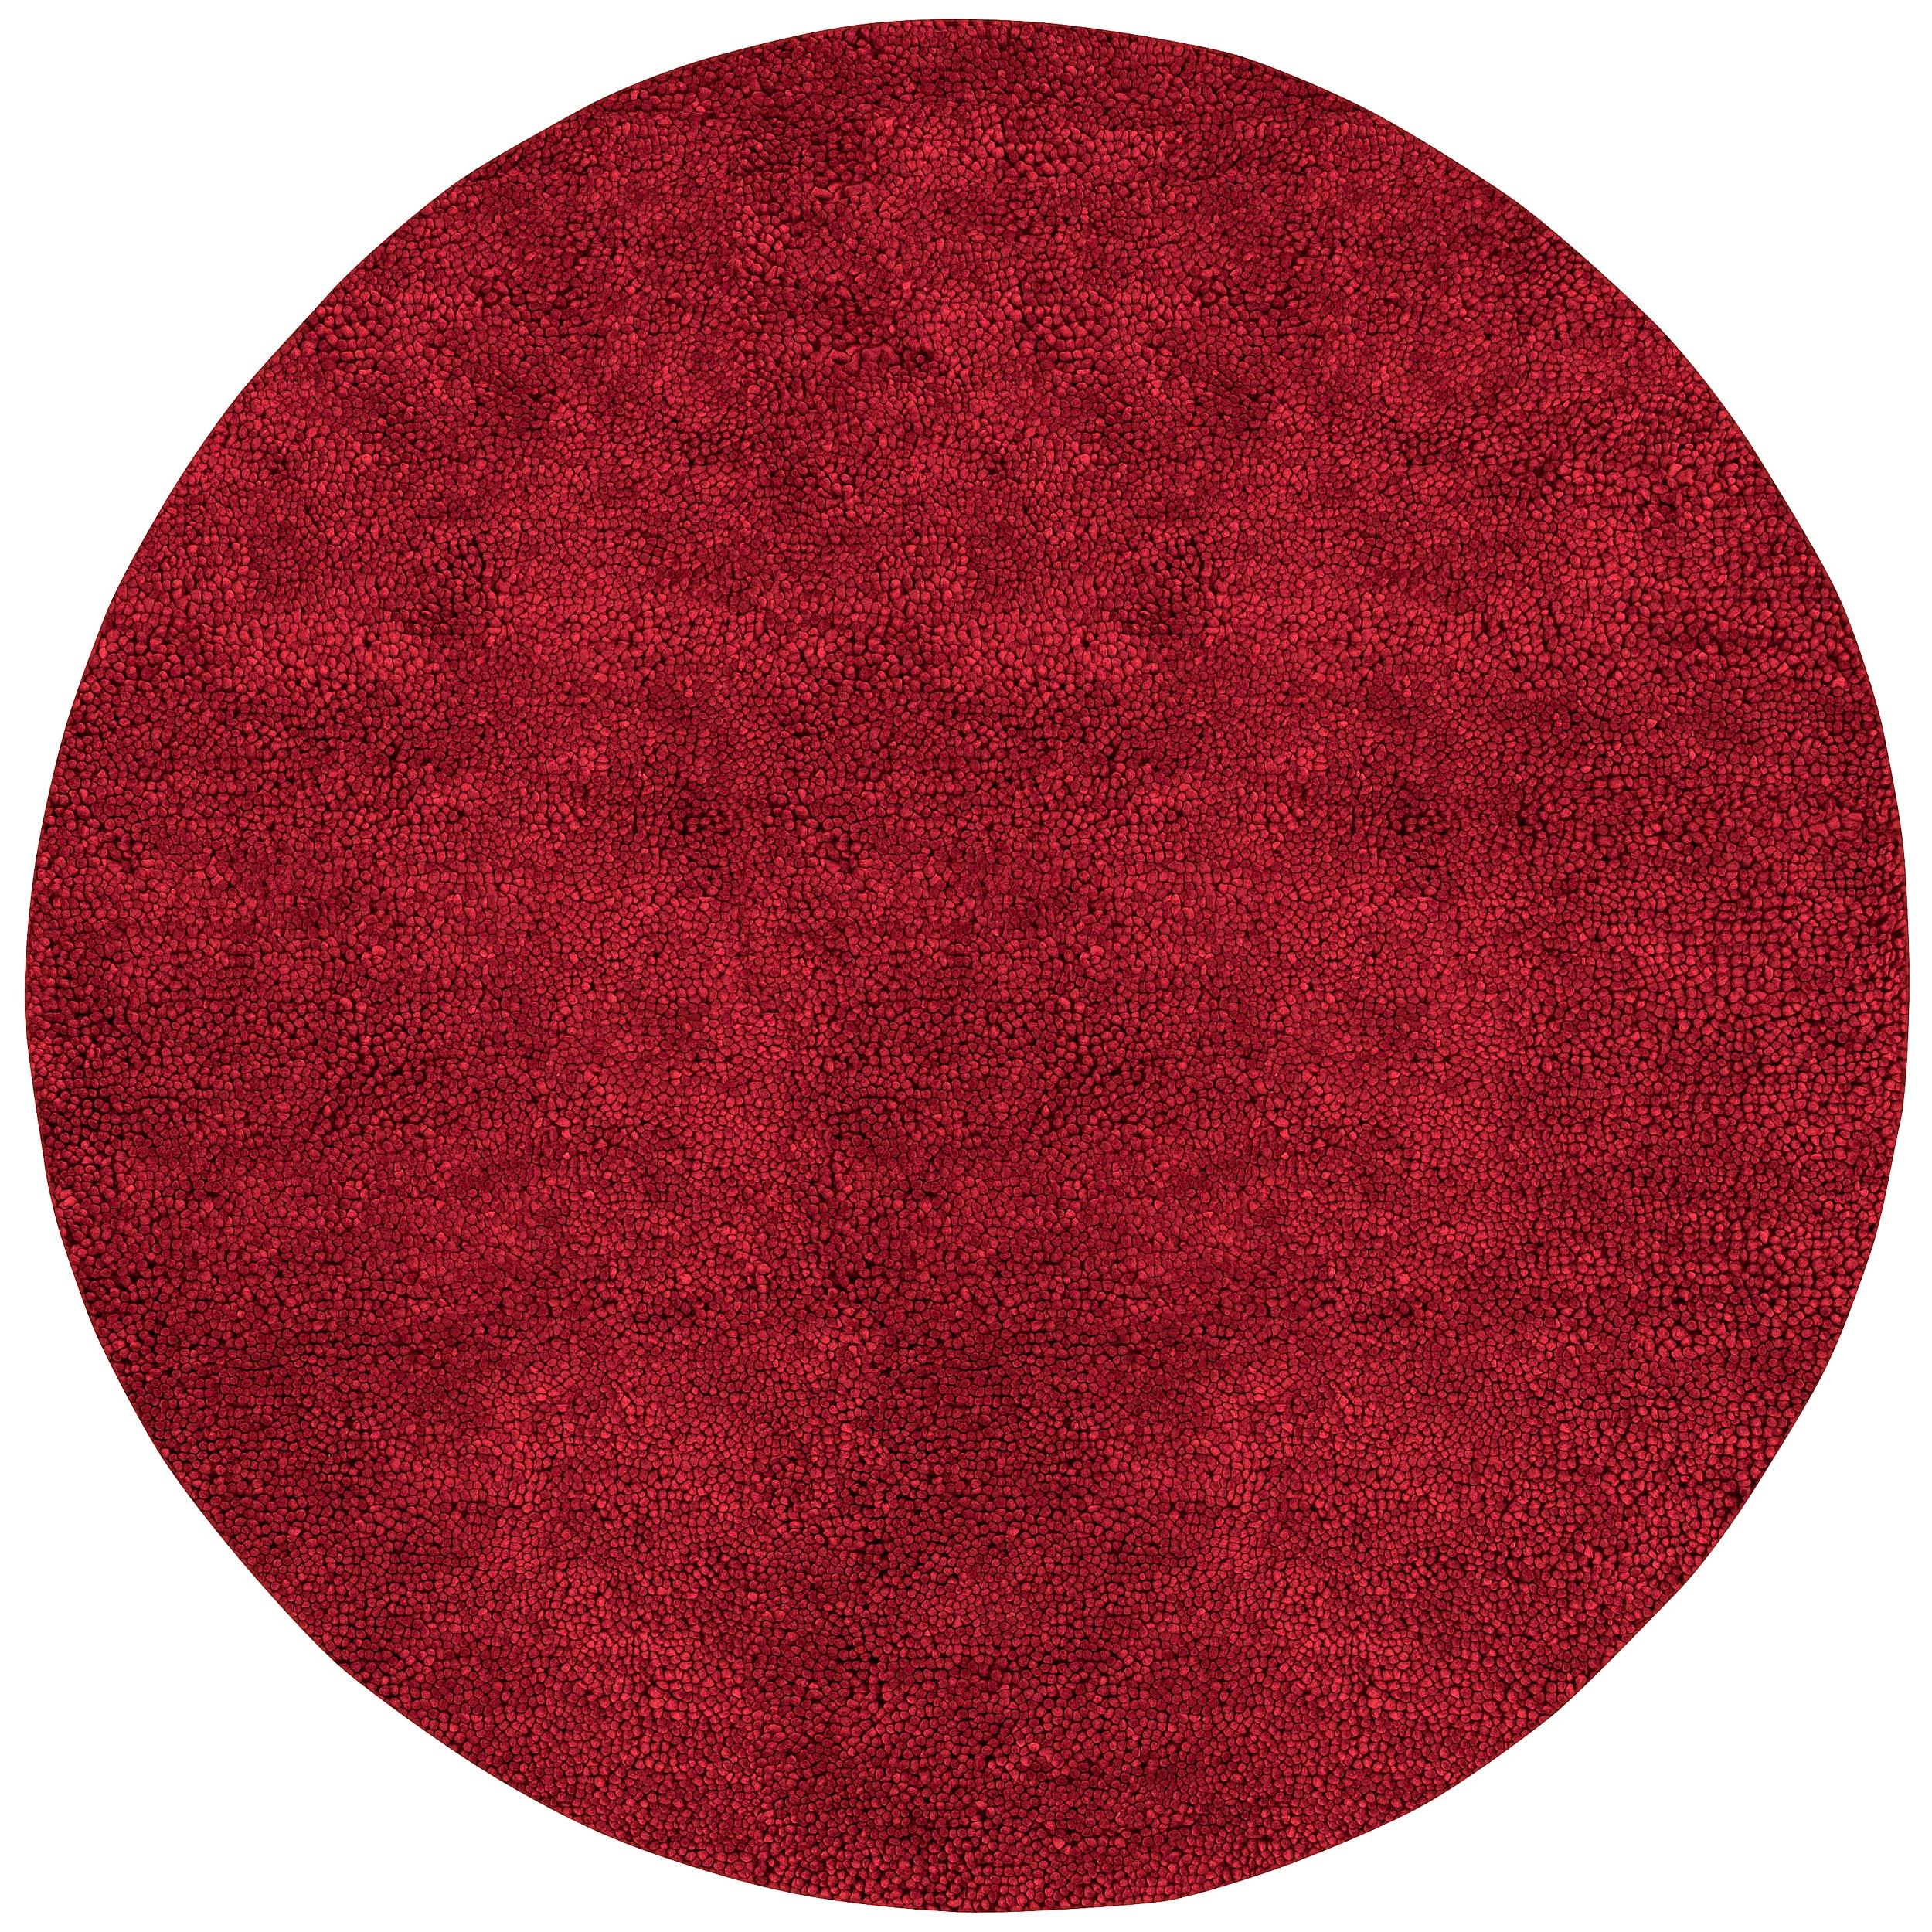 Hand-woven Huron Colorful Plush Shag New Zealand Felted Shag Wool Rug (10' Round)